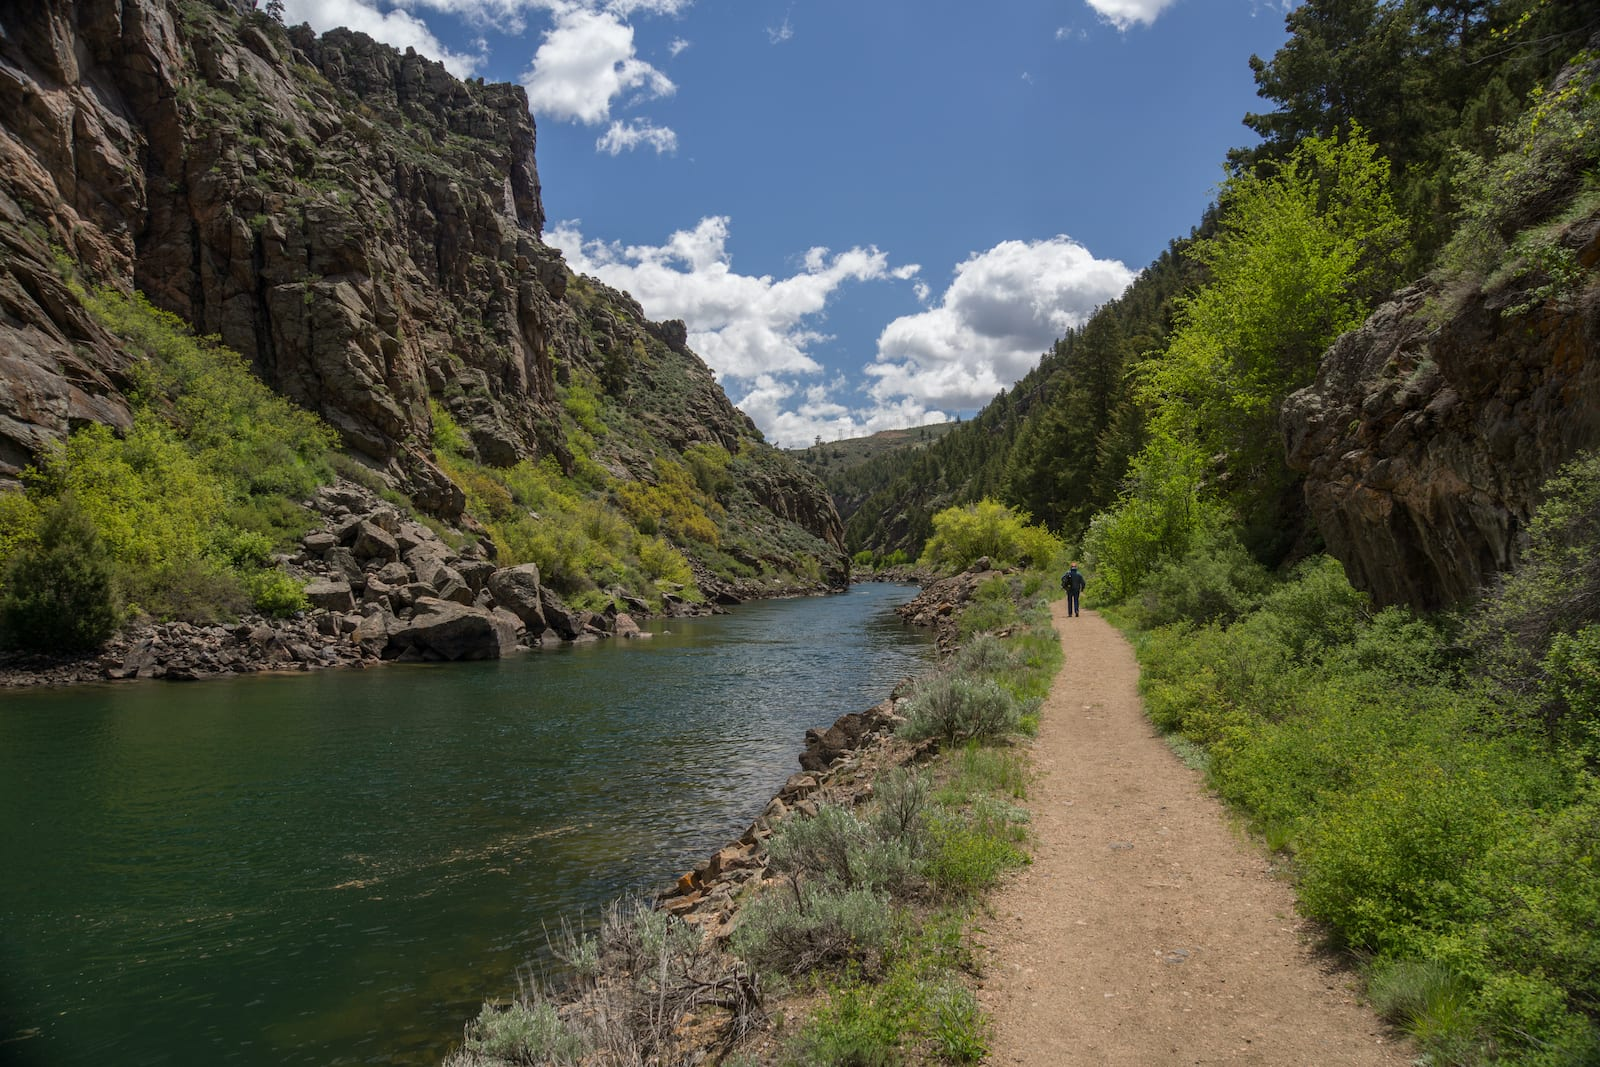 Gunnison River Hiking Trail Black Canyon of the Gunnison National Park